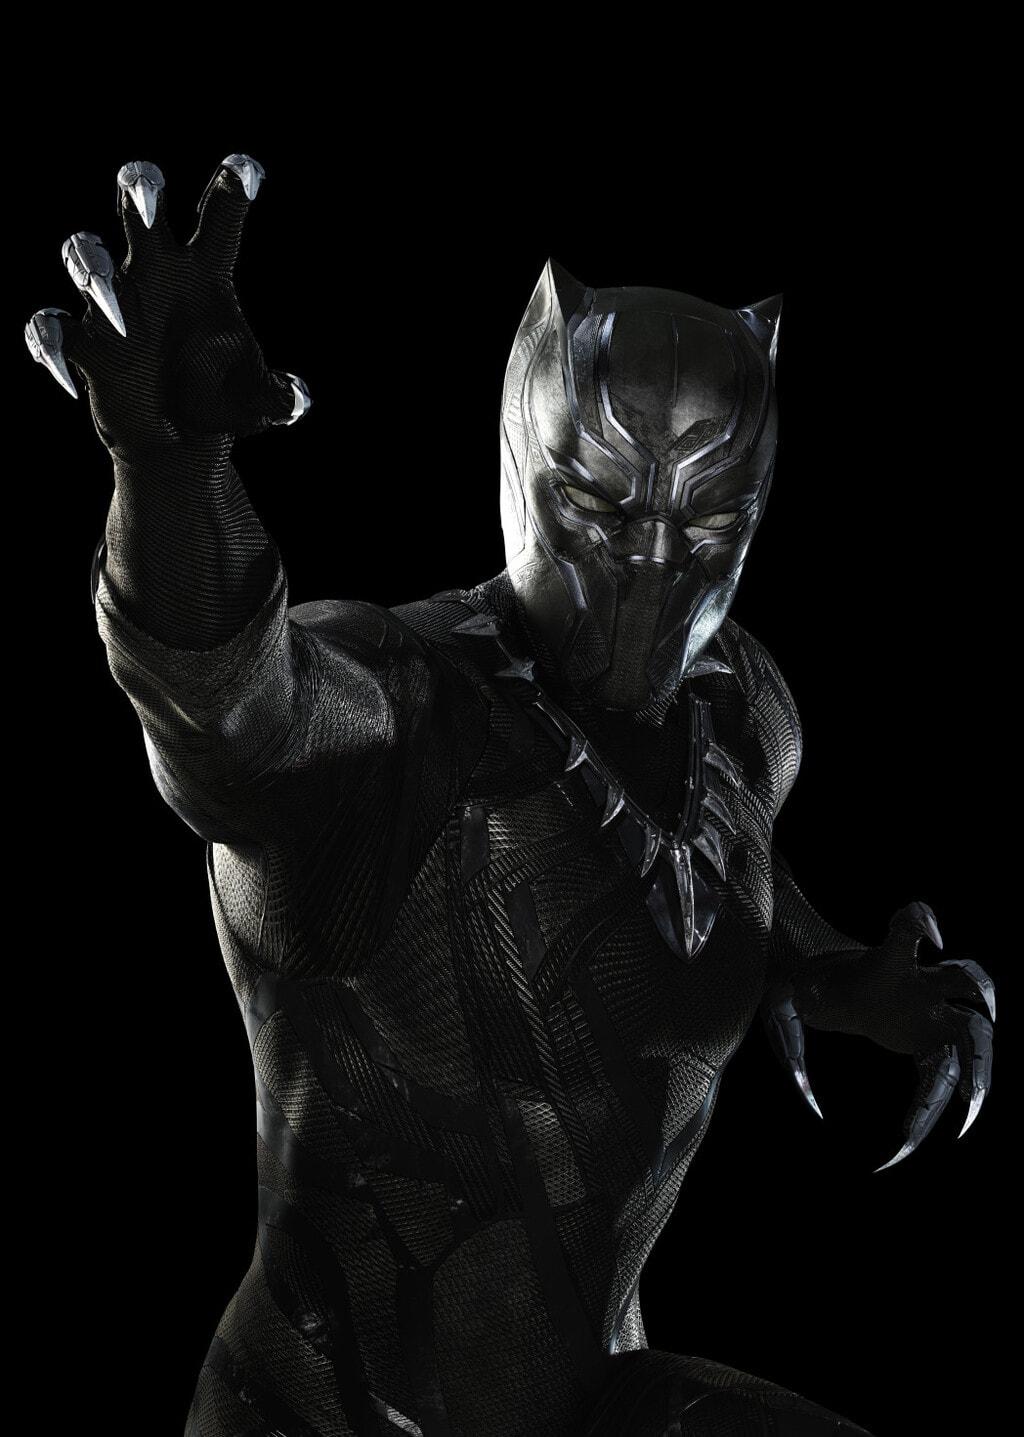 11 Reasons Captain America Civil War is the Best Marvel Movie